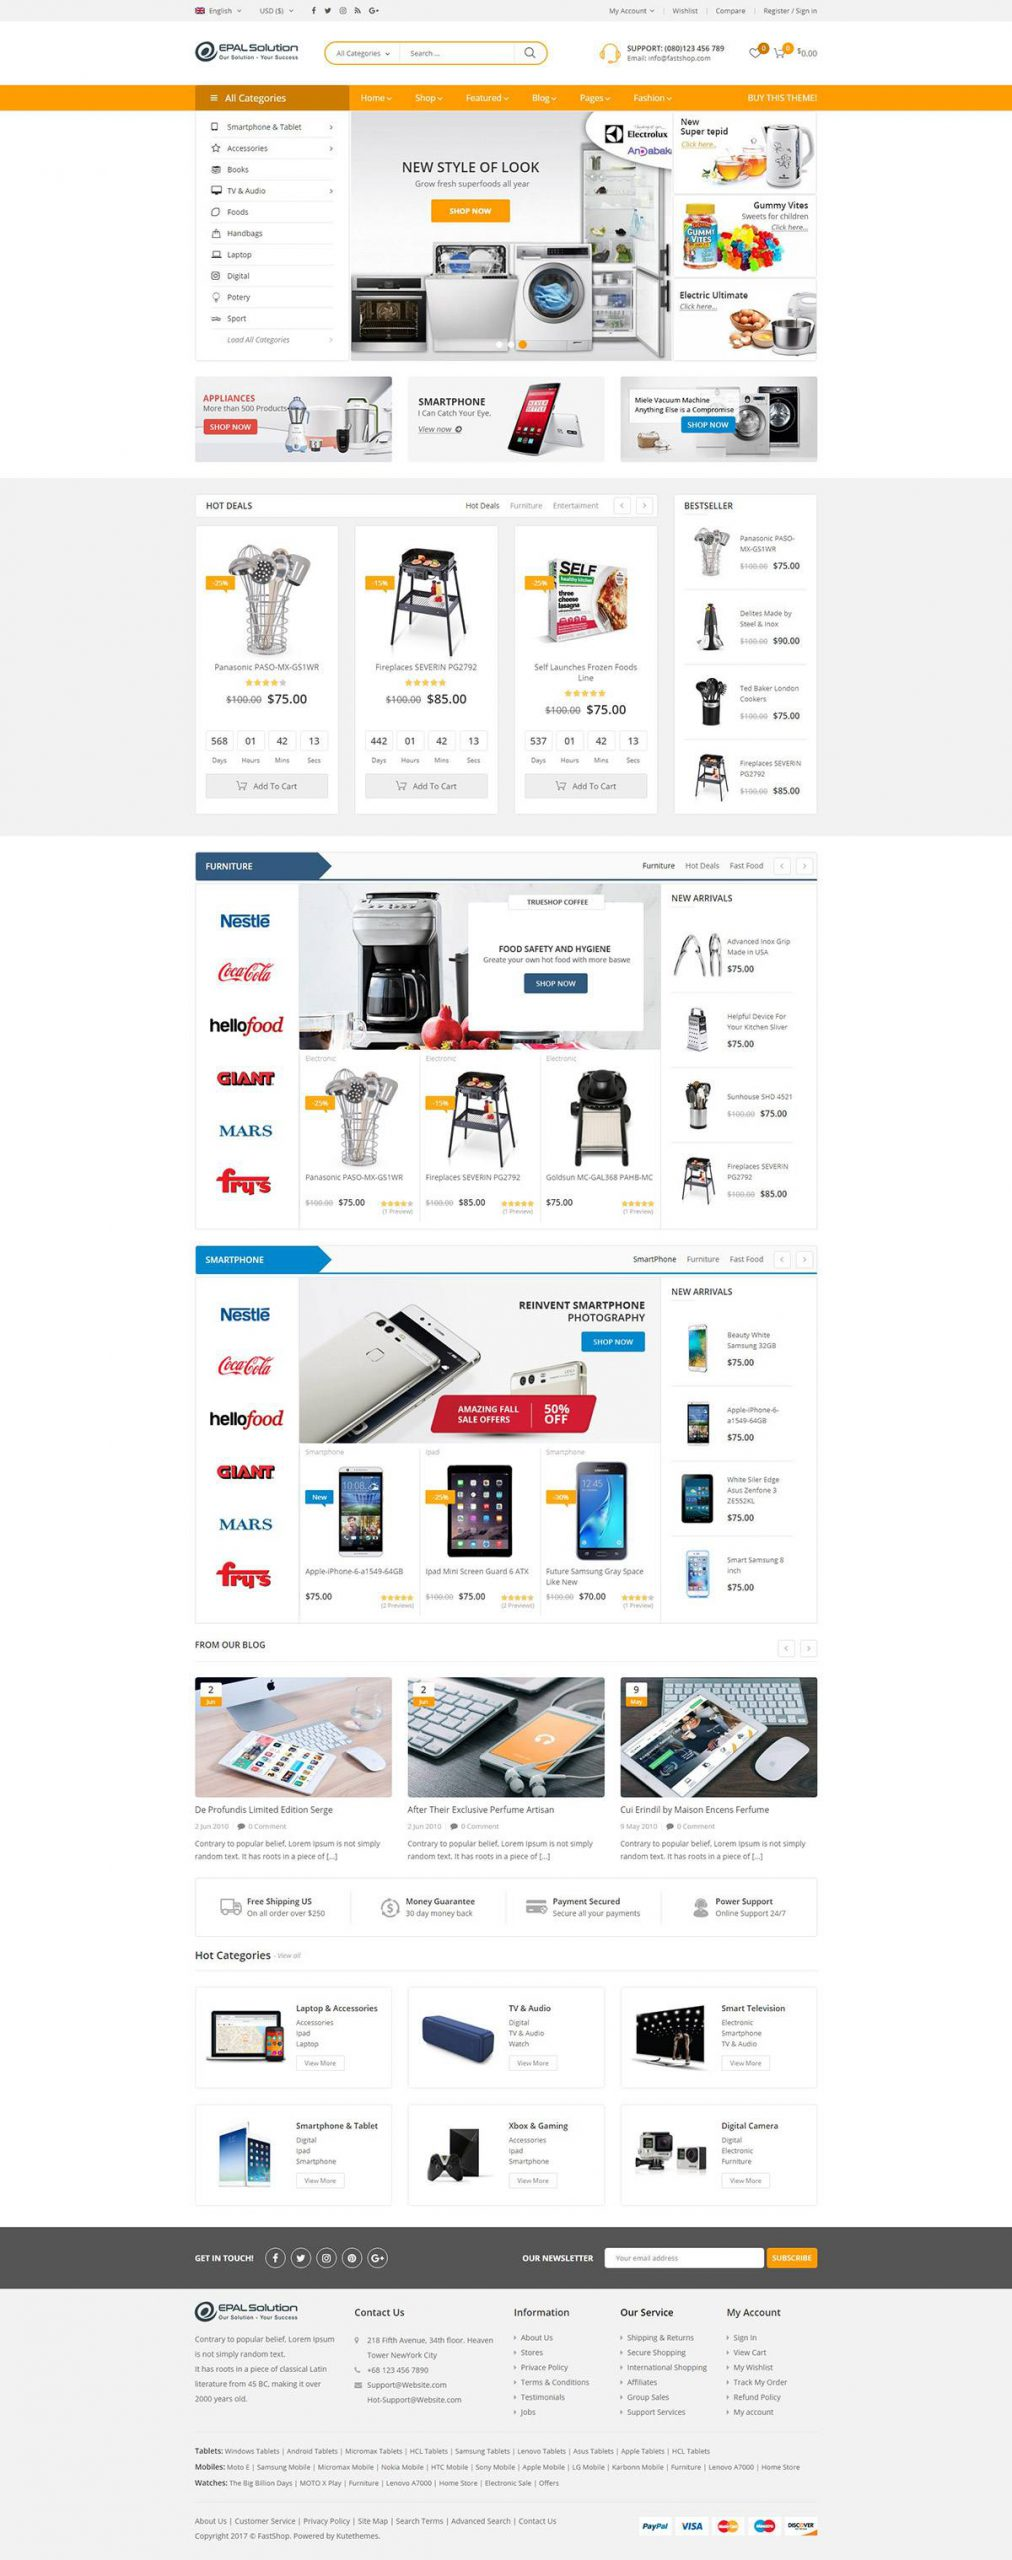 Giao-dien-website-thuong-mai-dien-tu-Fastshop